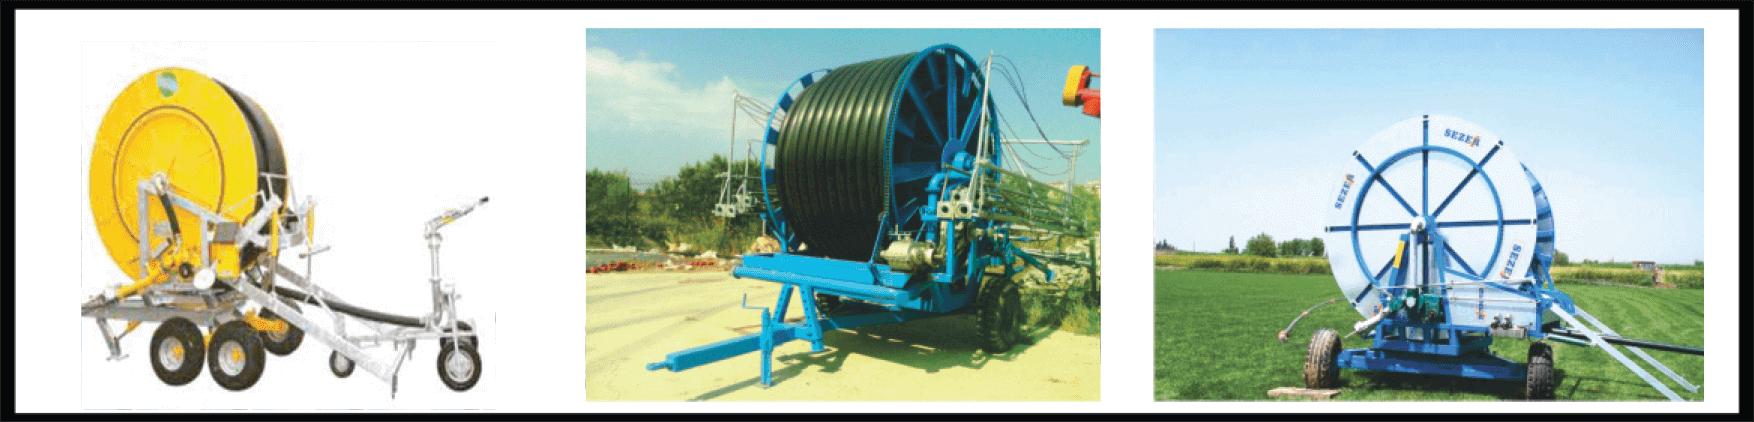 Agricultural irrigation - tarlasuvarma 0001 Layer 2 - Agricultural irrigation